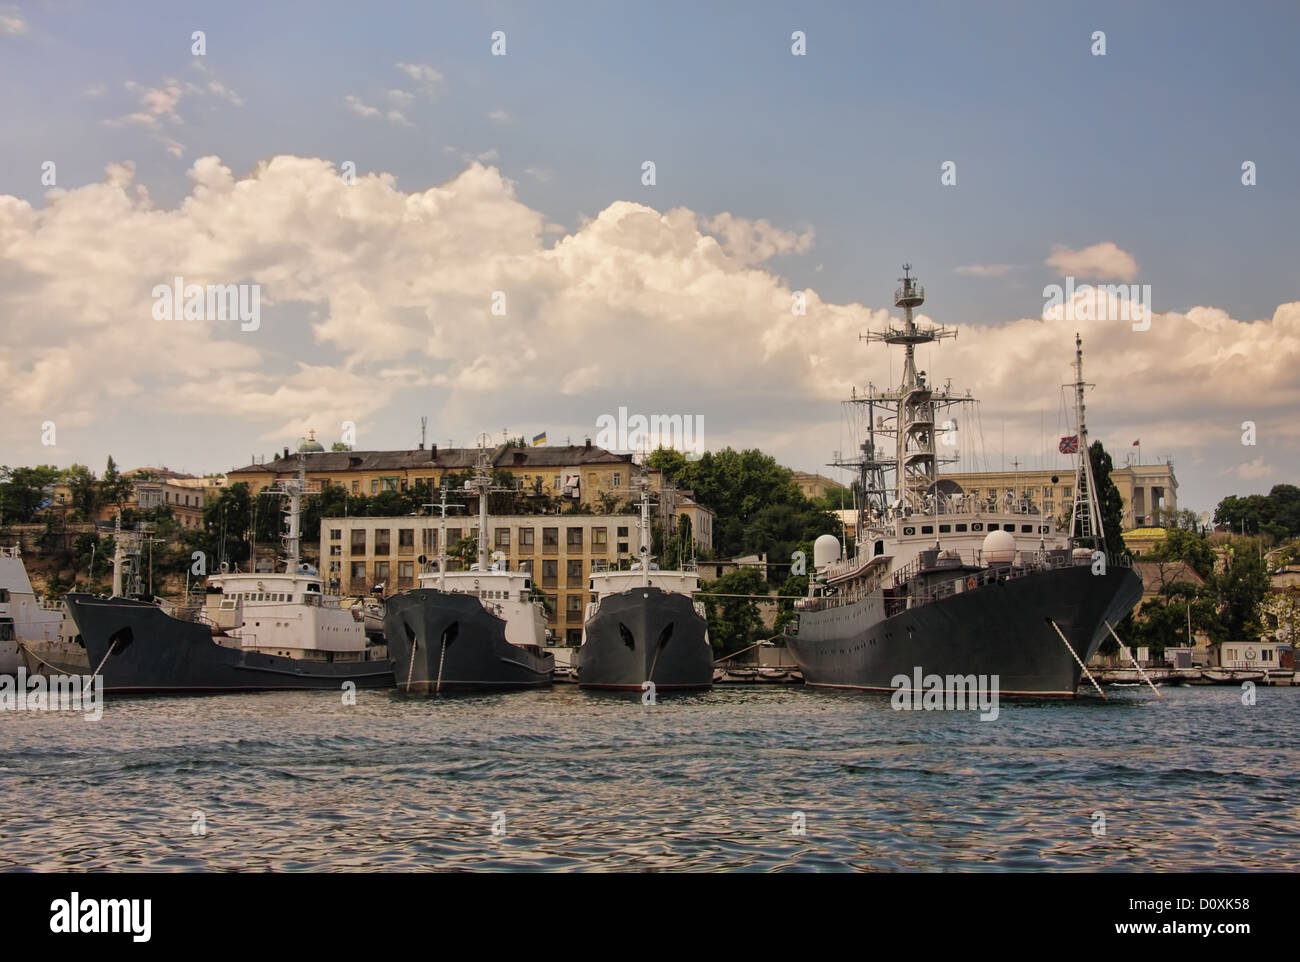 Battleships at mooring - Stock Image